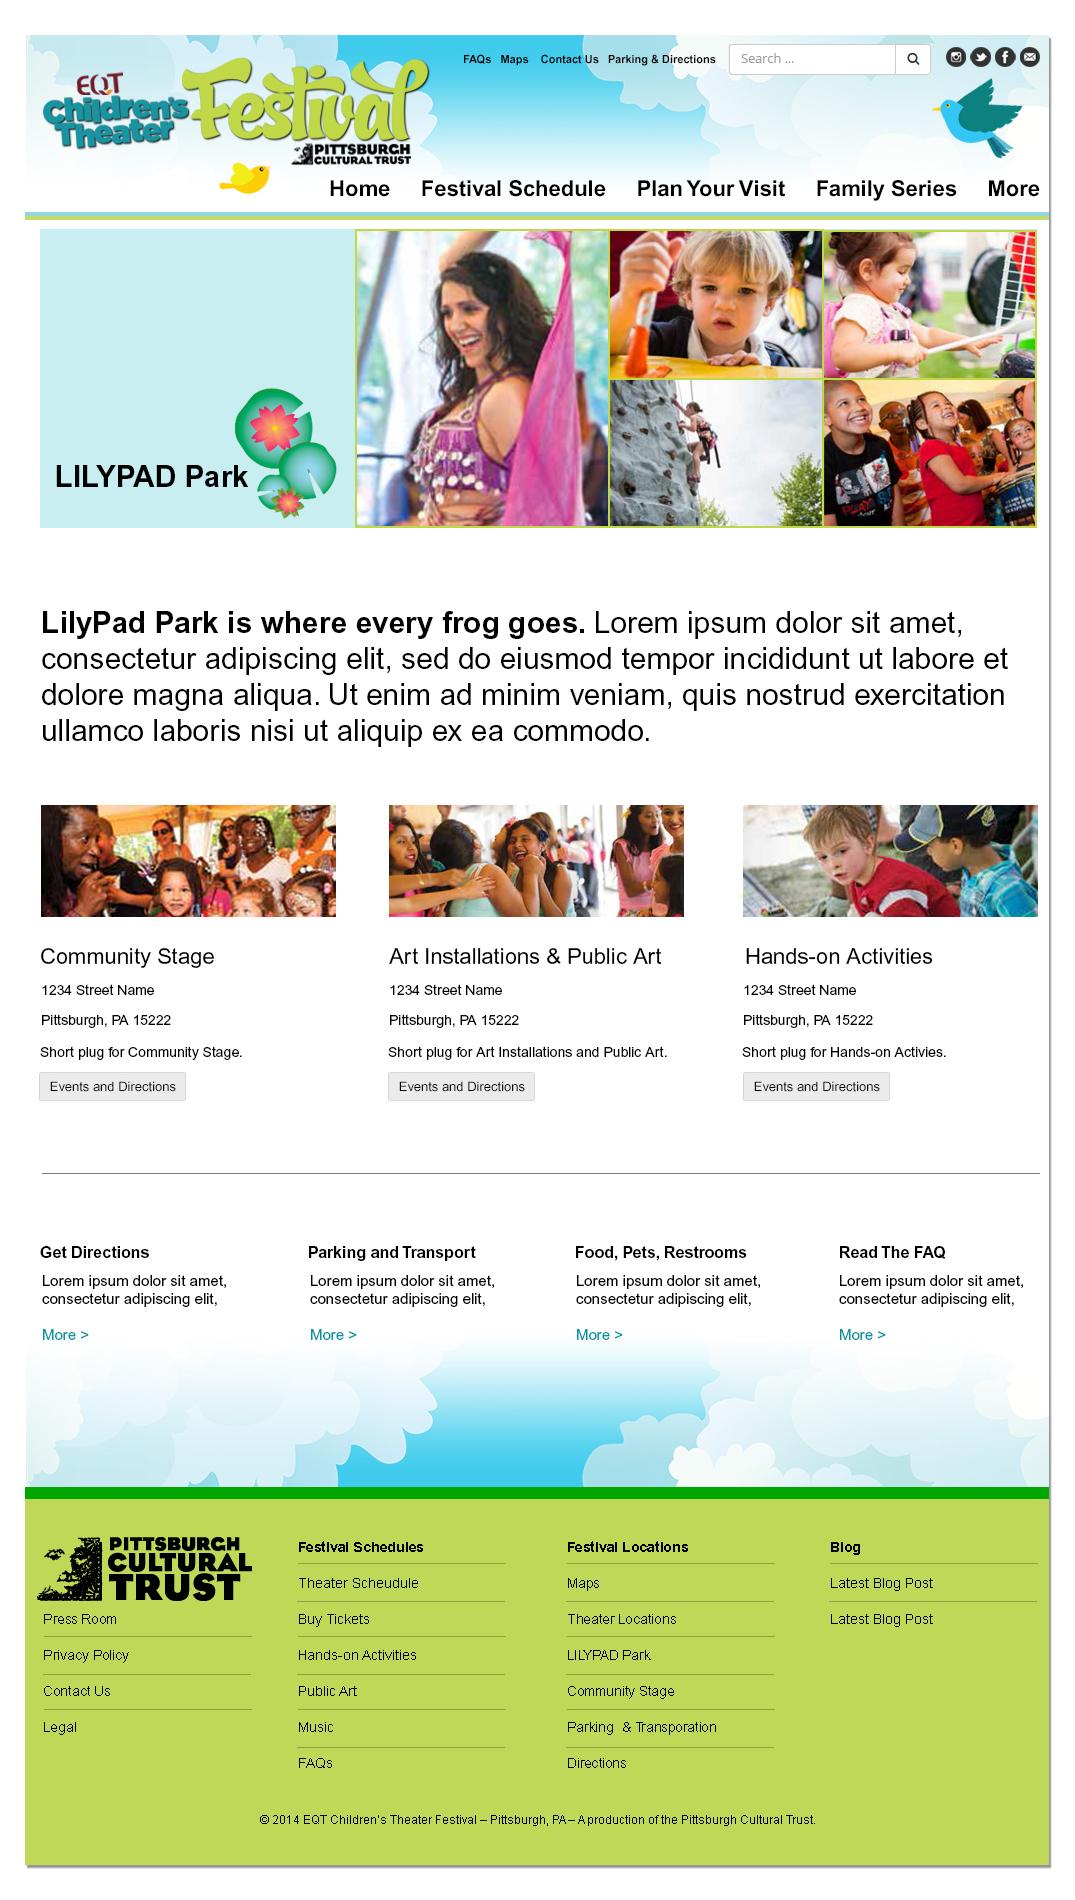 1024 Main Location Page (LilyPad Park)